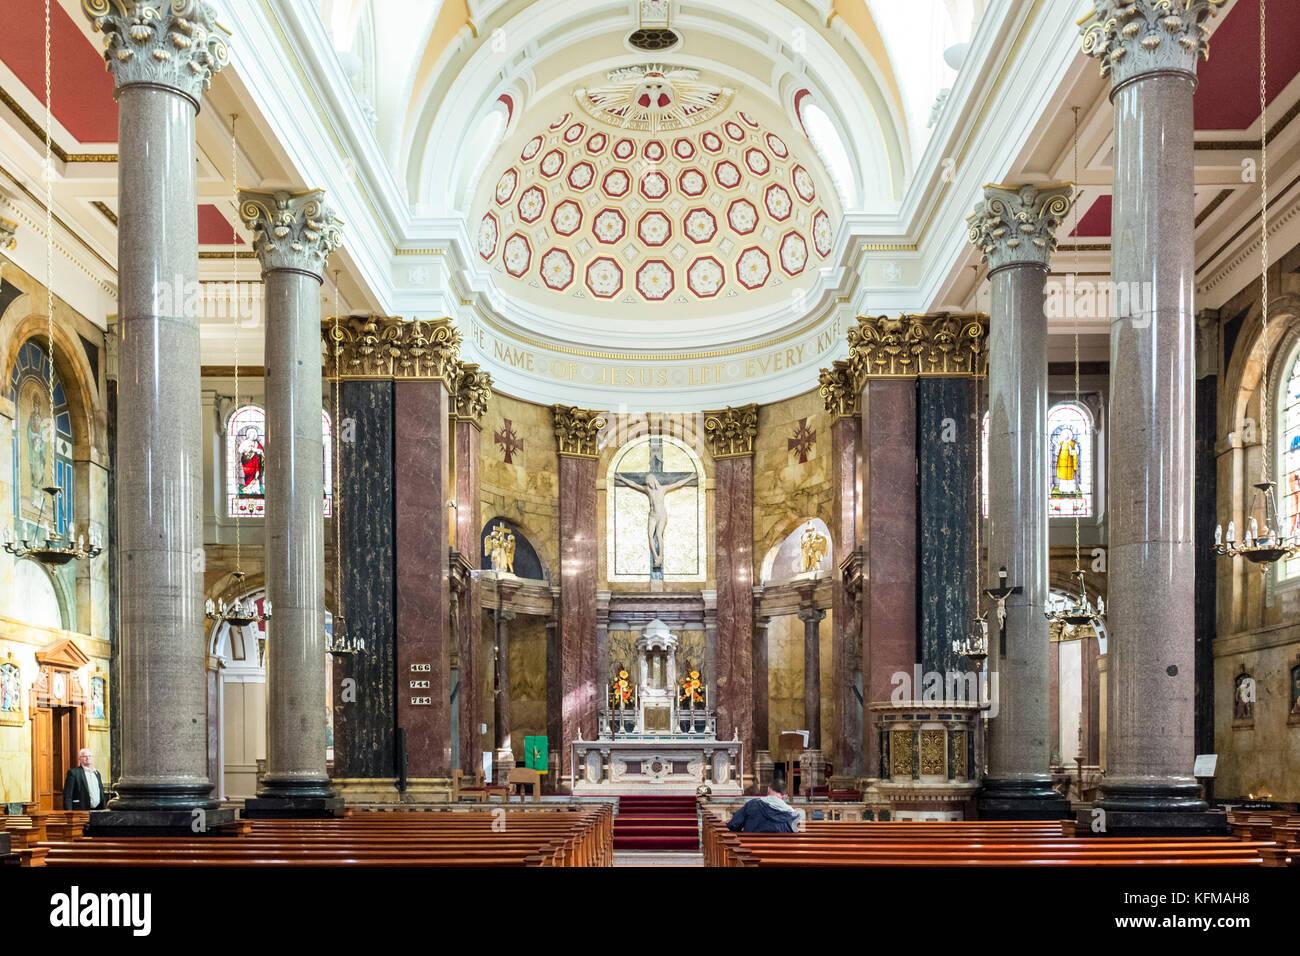 Interior of  St Wilfrid's Roman Catholic Church, Preston, Lancashire Chapel St, Preston - Stock Image